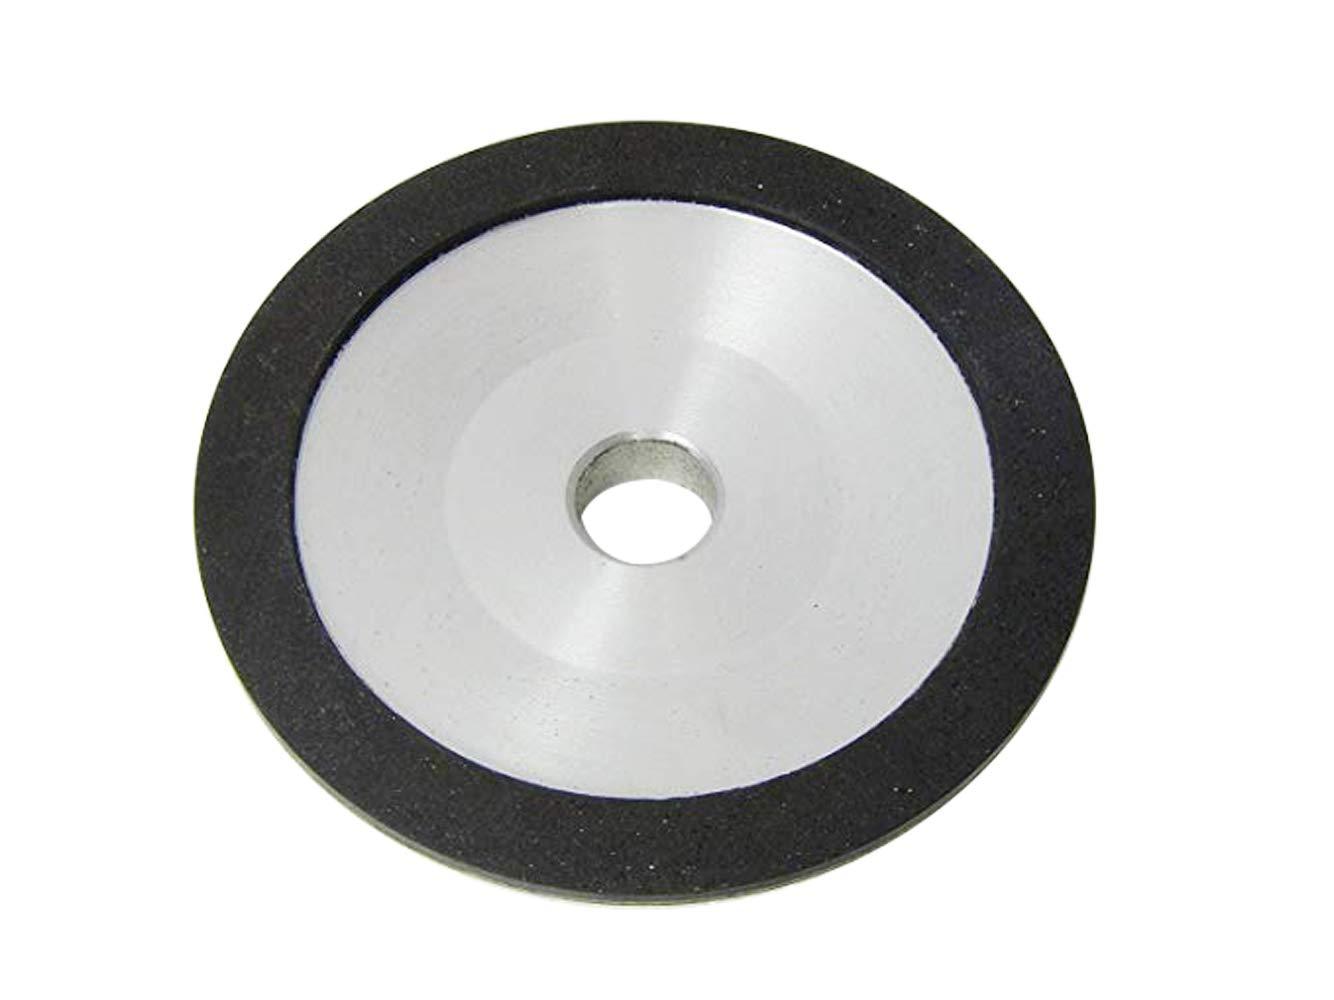 Diameter 80mm Grinding wheels for Round Carbide Saw Blade sharpener grinder